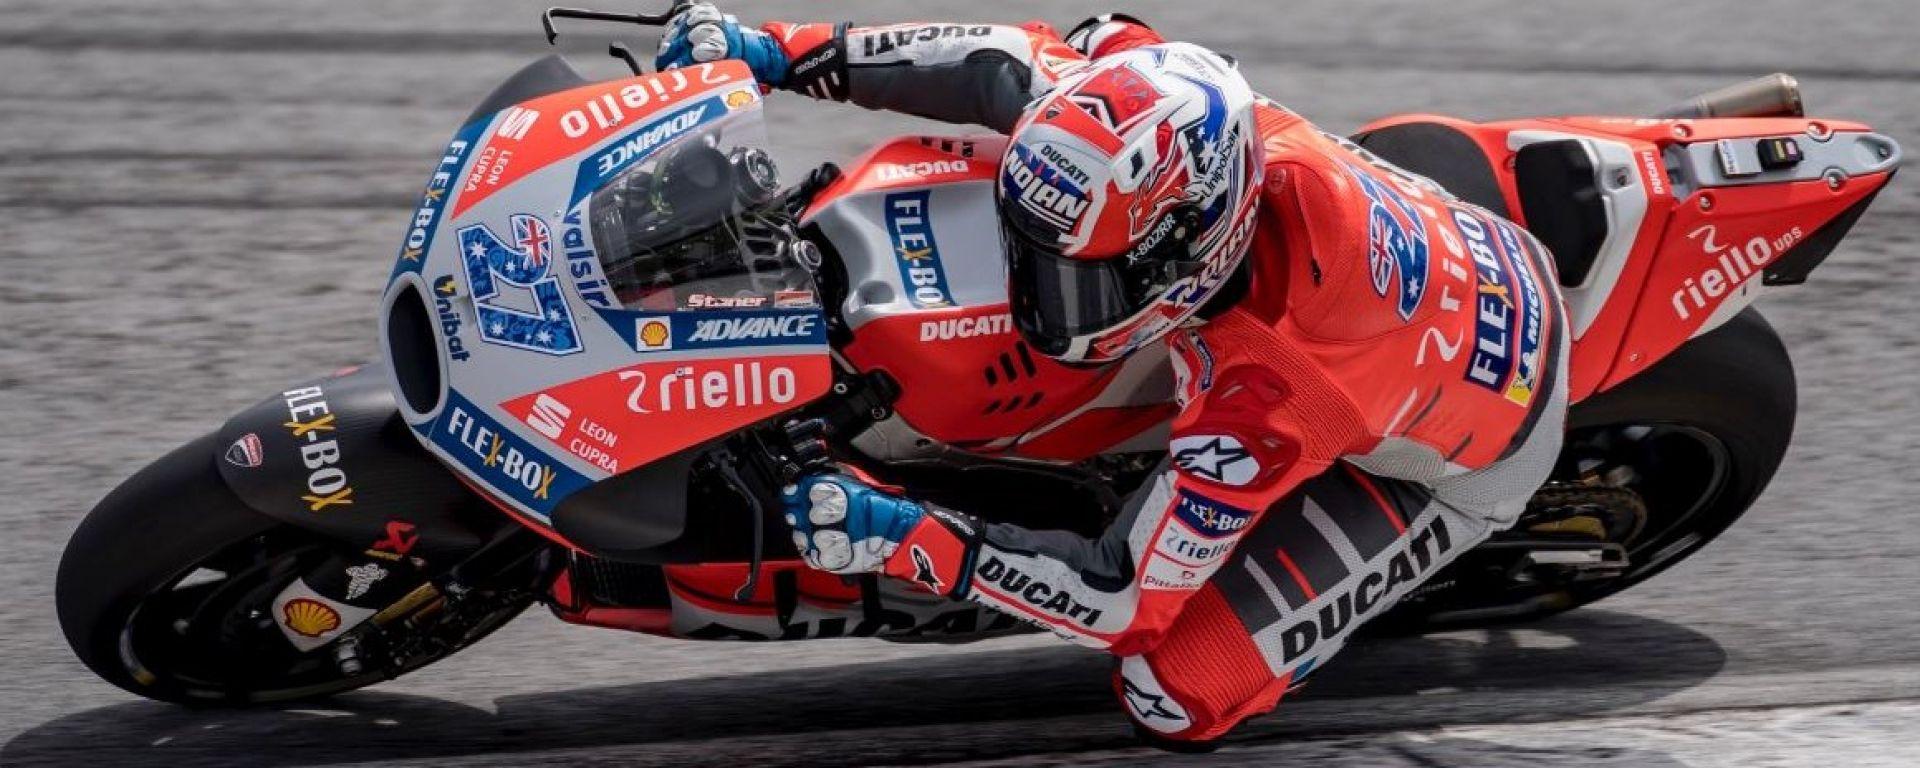 MotoGP, Test Sepang 2018, Day 2: Casey Stoner fa volare la nuova Ducati - MotorBox